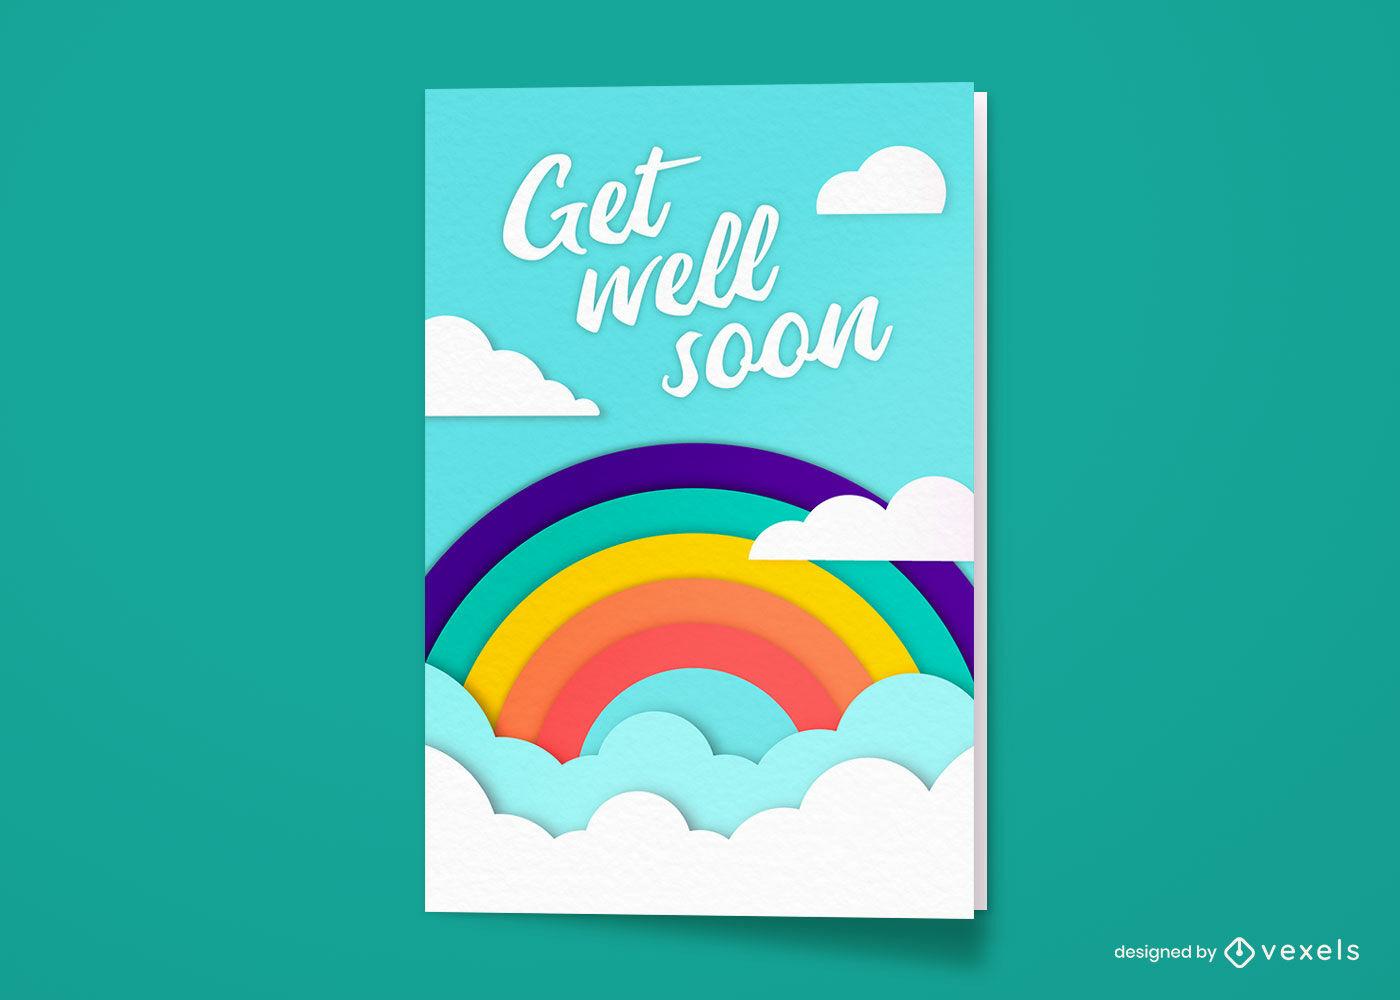 Get well soon rainbow greeting card design